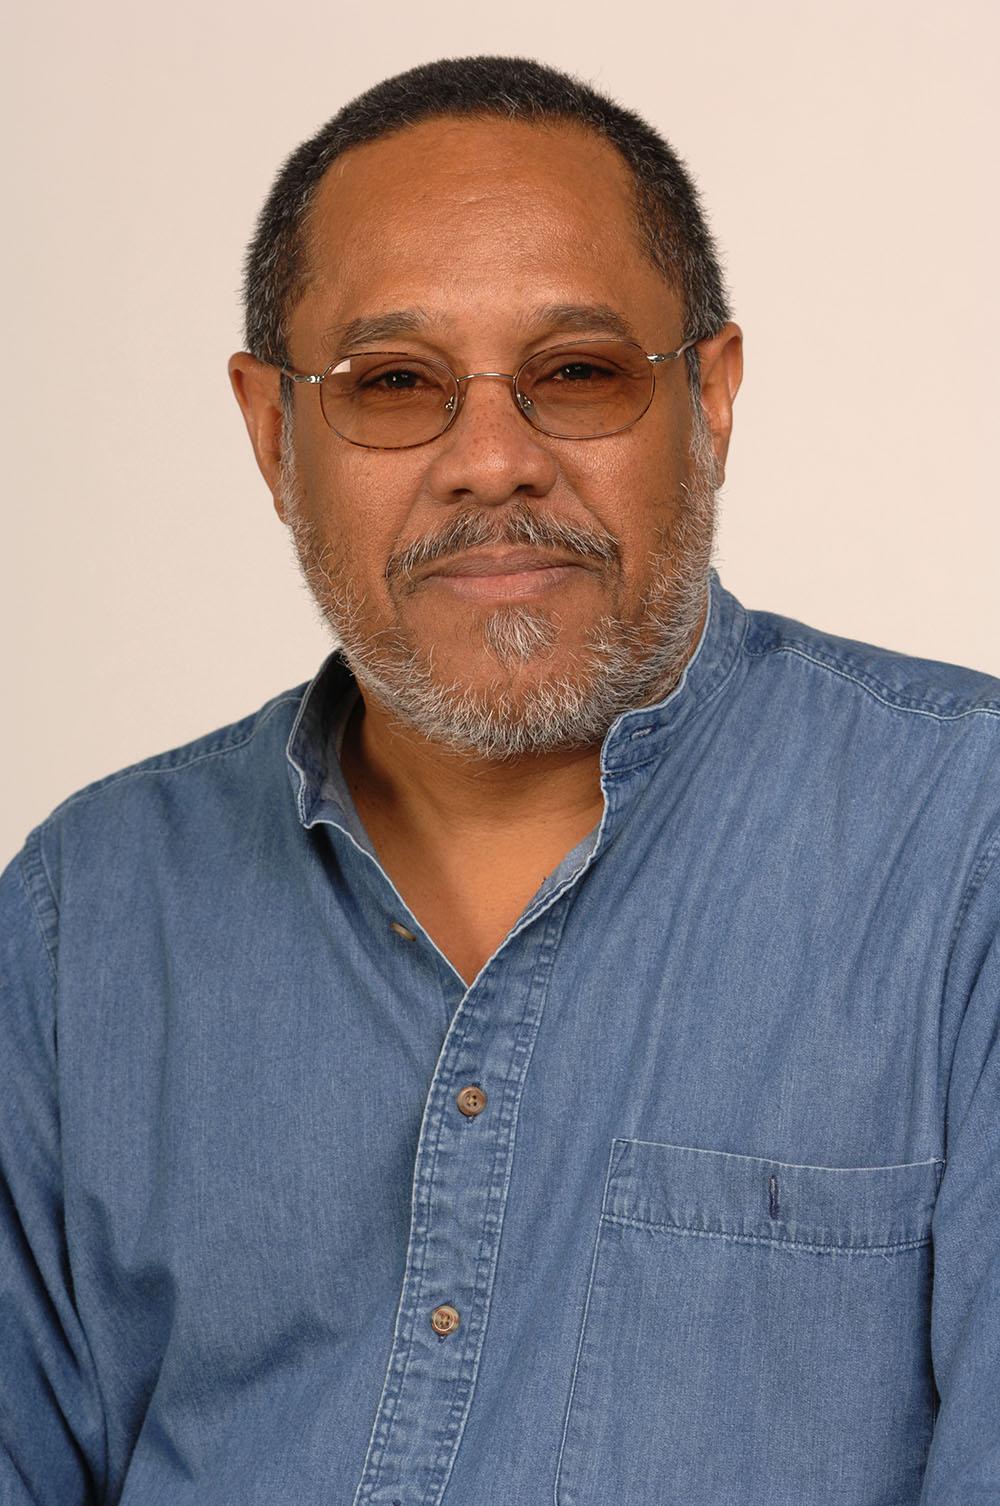 Norman Pestaina Portrait